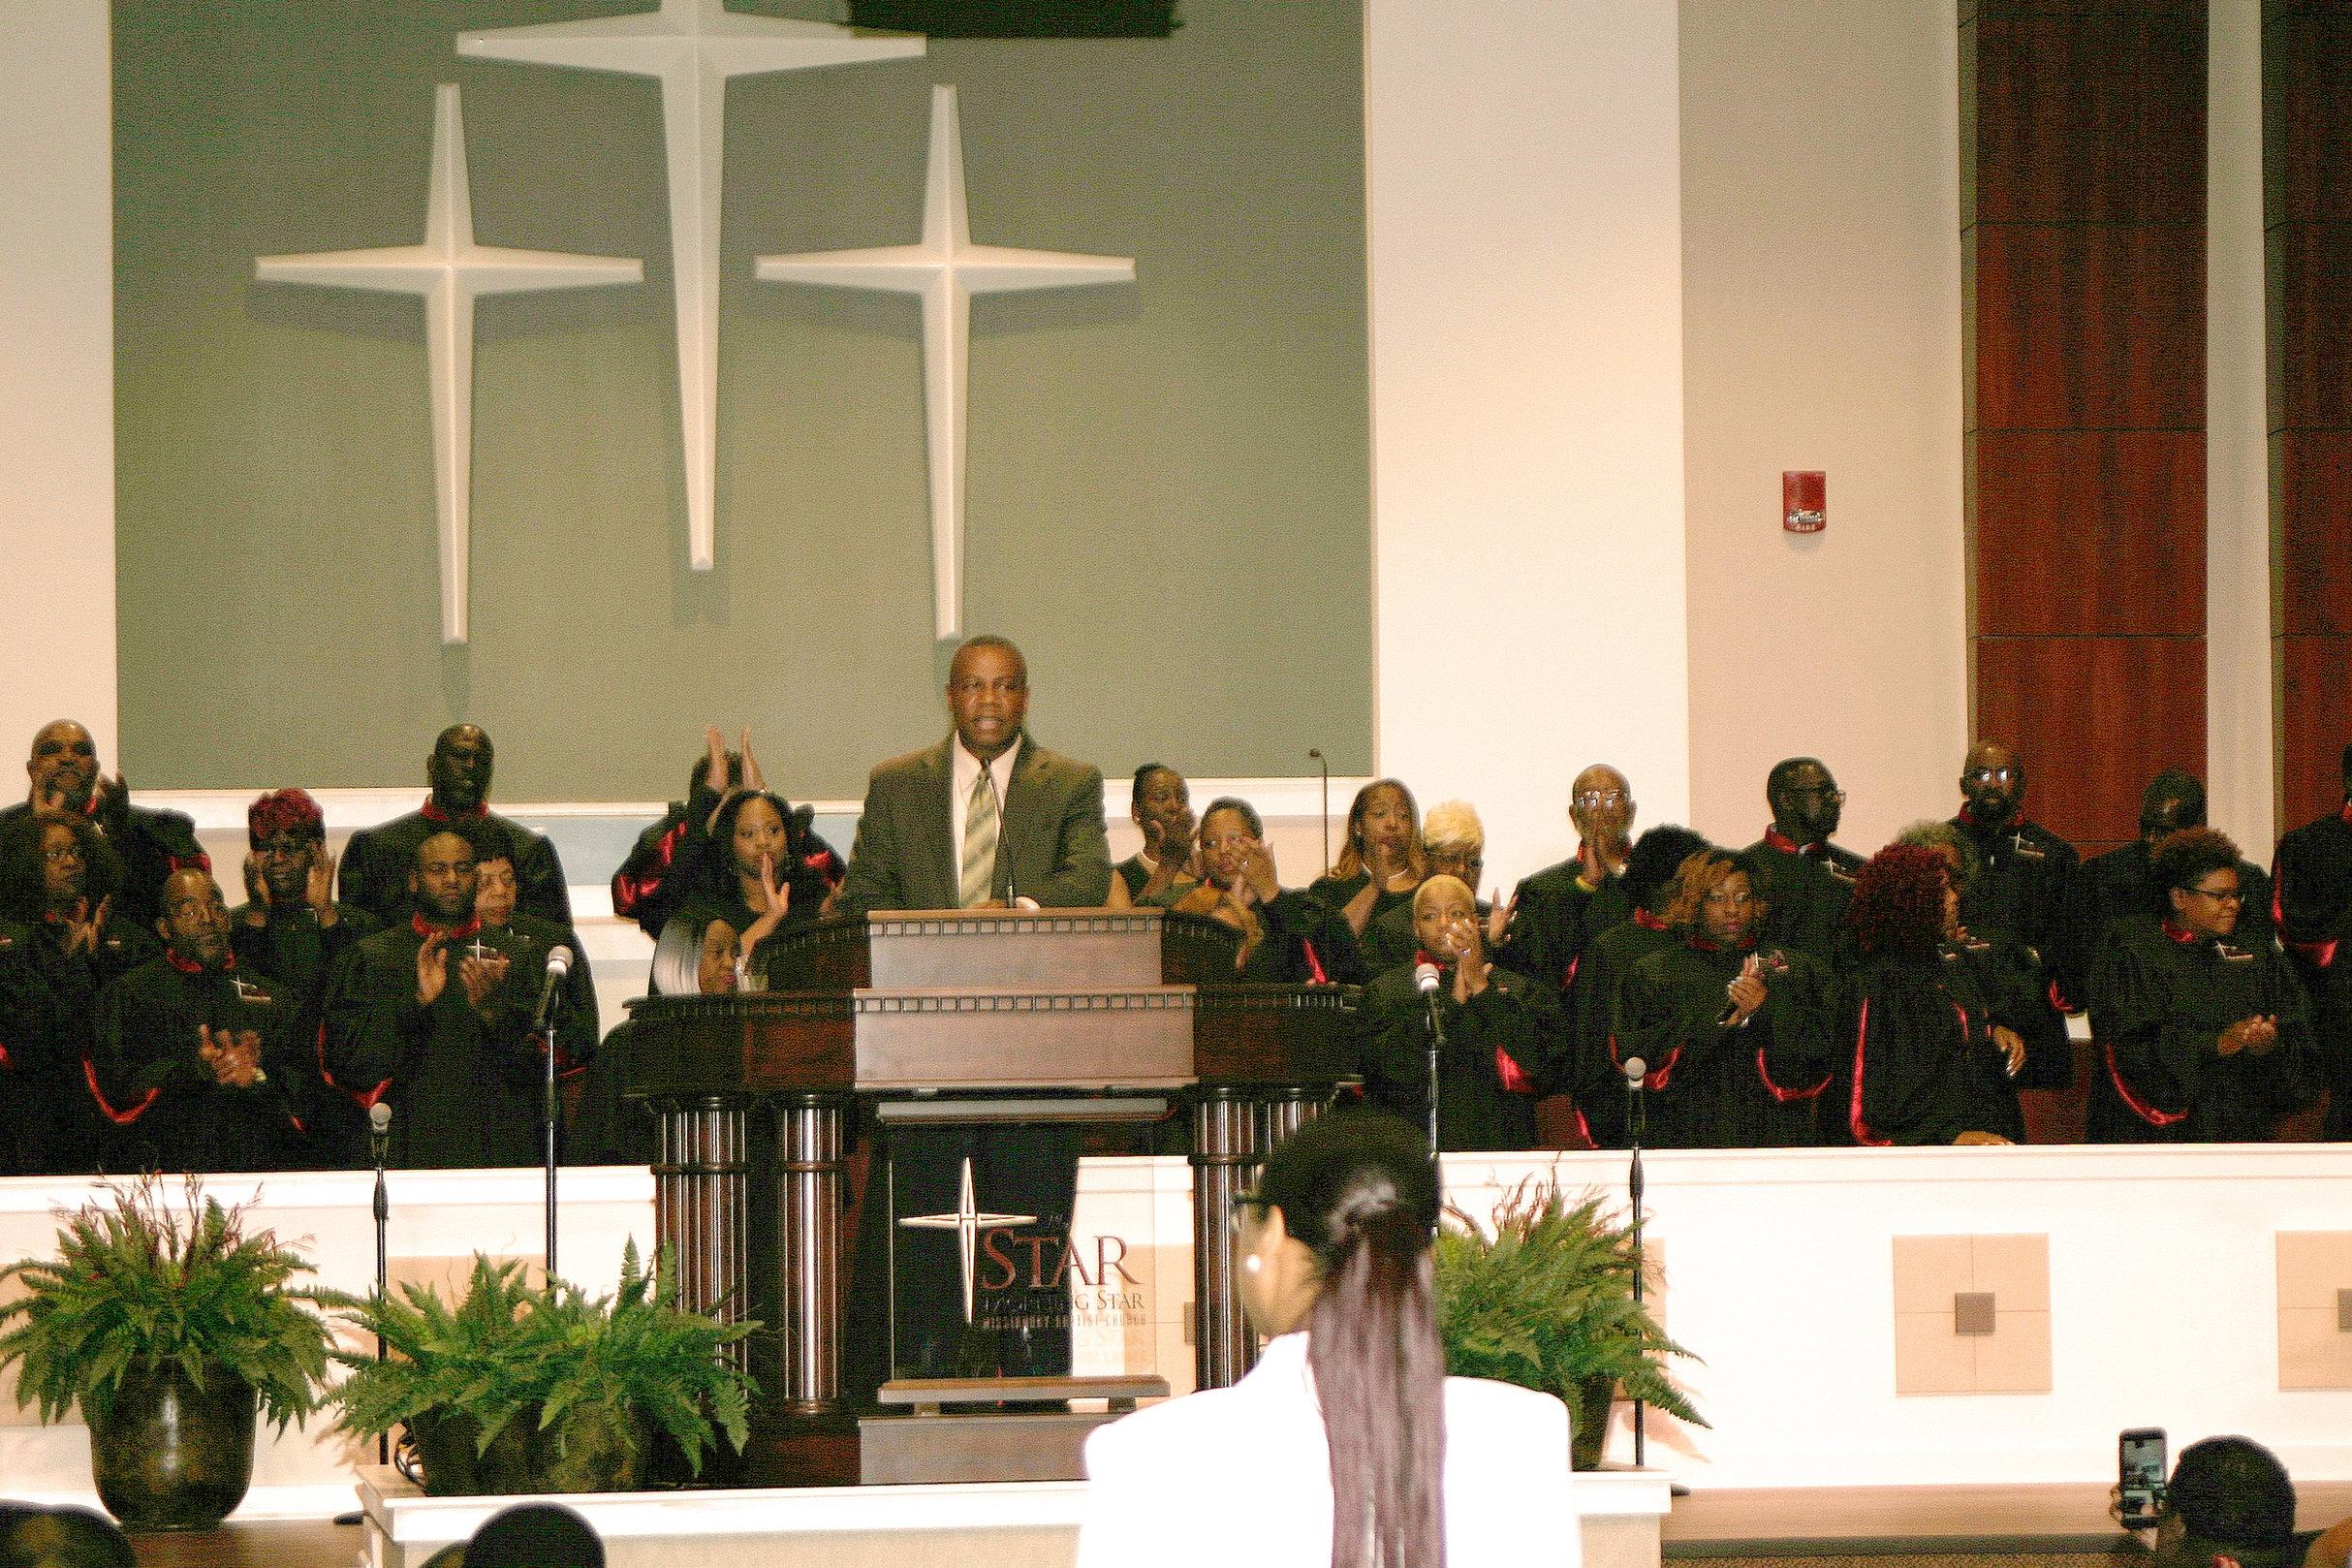 MORNING STAR BAPTIST CHURCH SANCTUARY